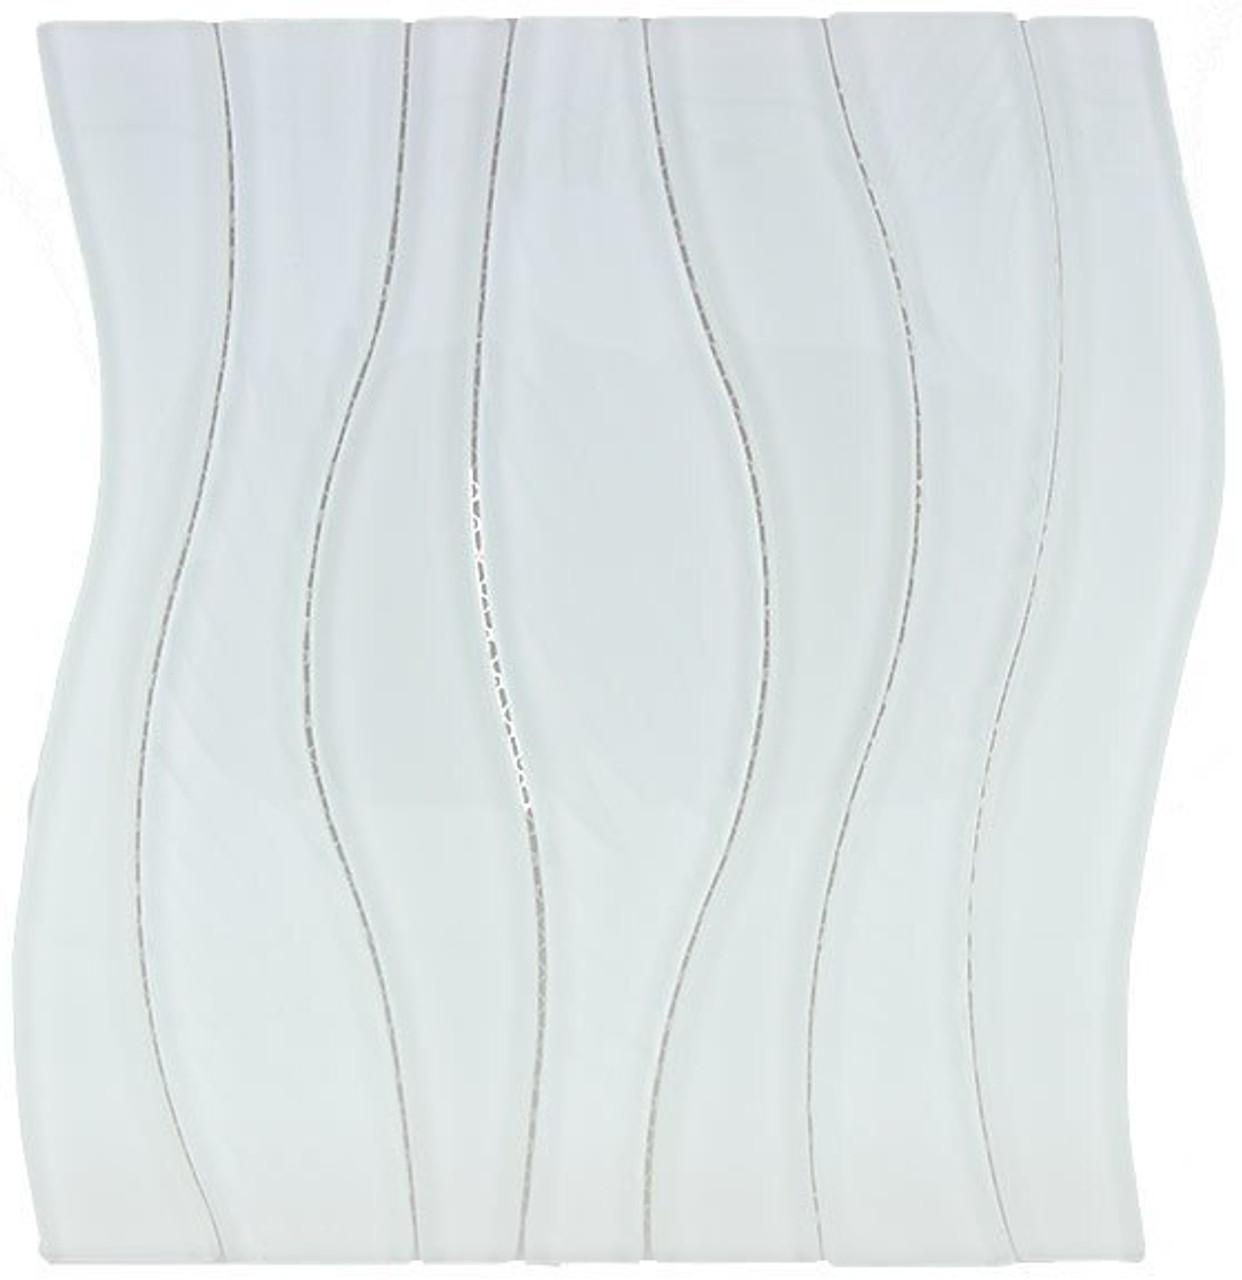 Bella Glass Tiles Waterfall Series White Rose